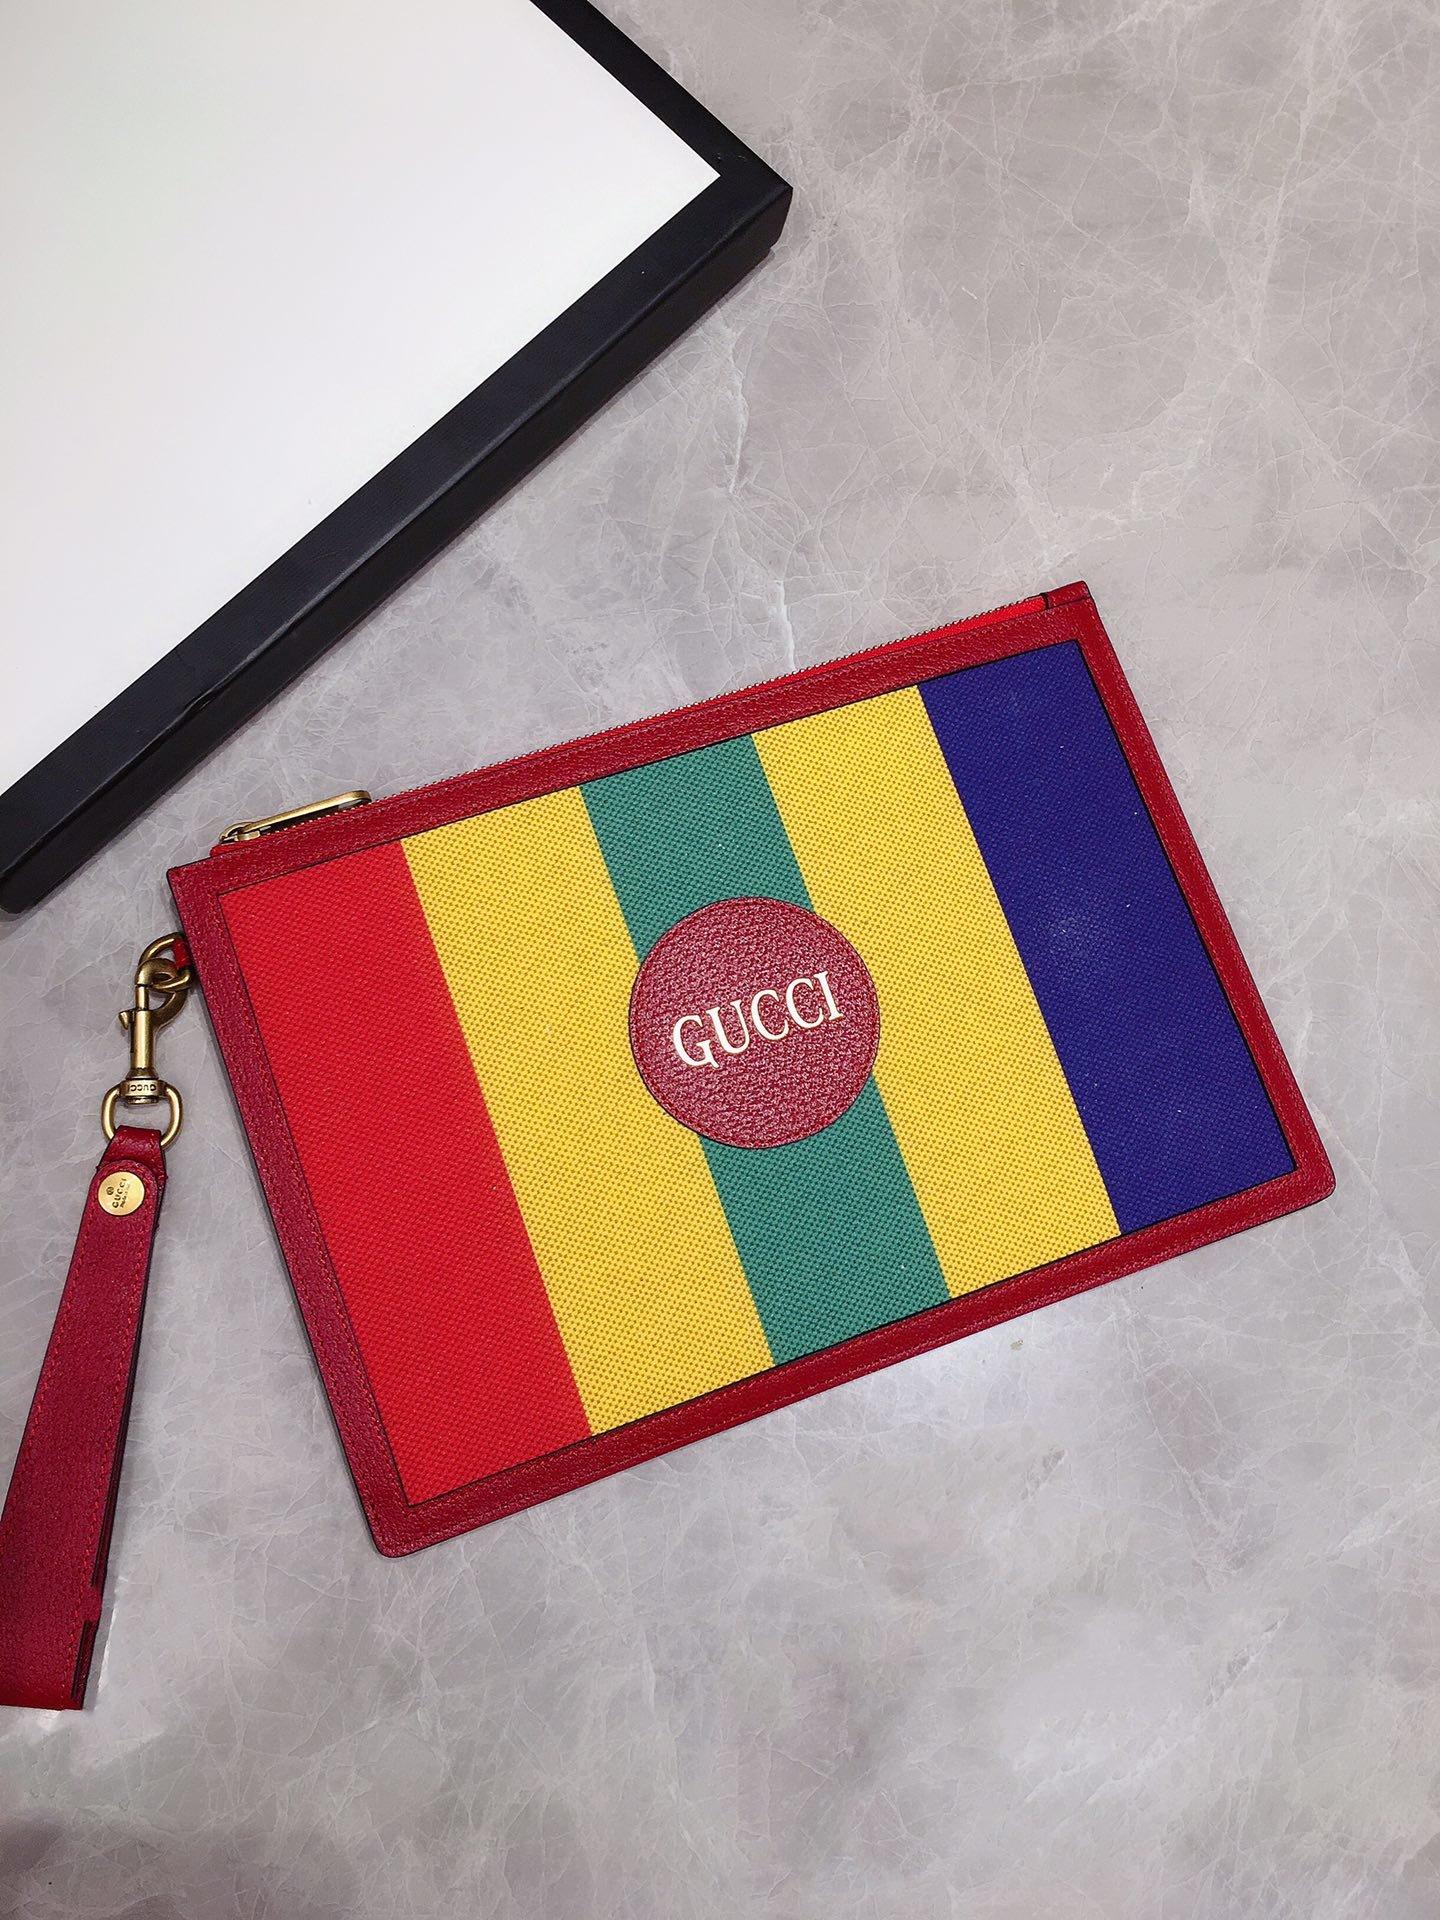 Gucci专柜同步上新 原单出品 Baiadera宽条纹帆布手拿包 (图2)